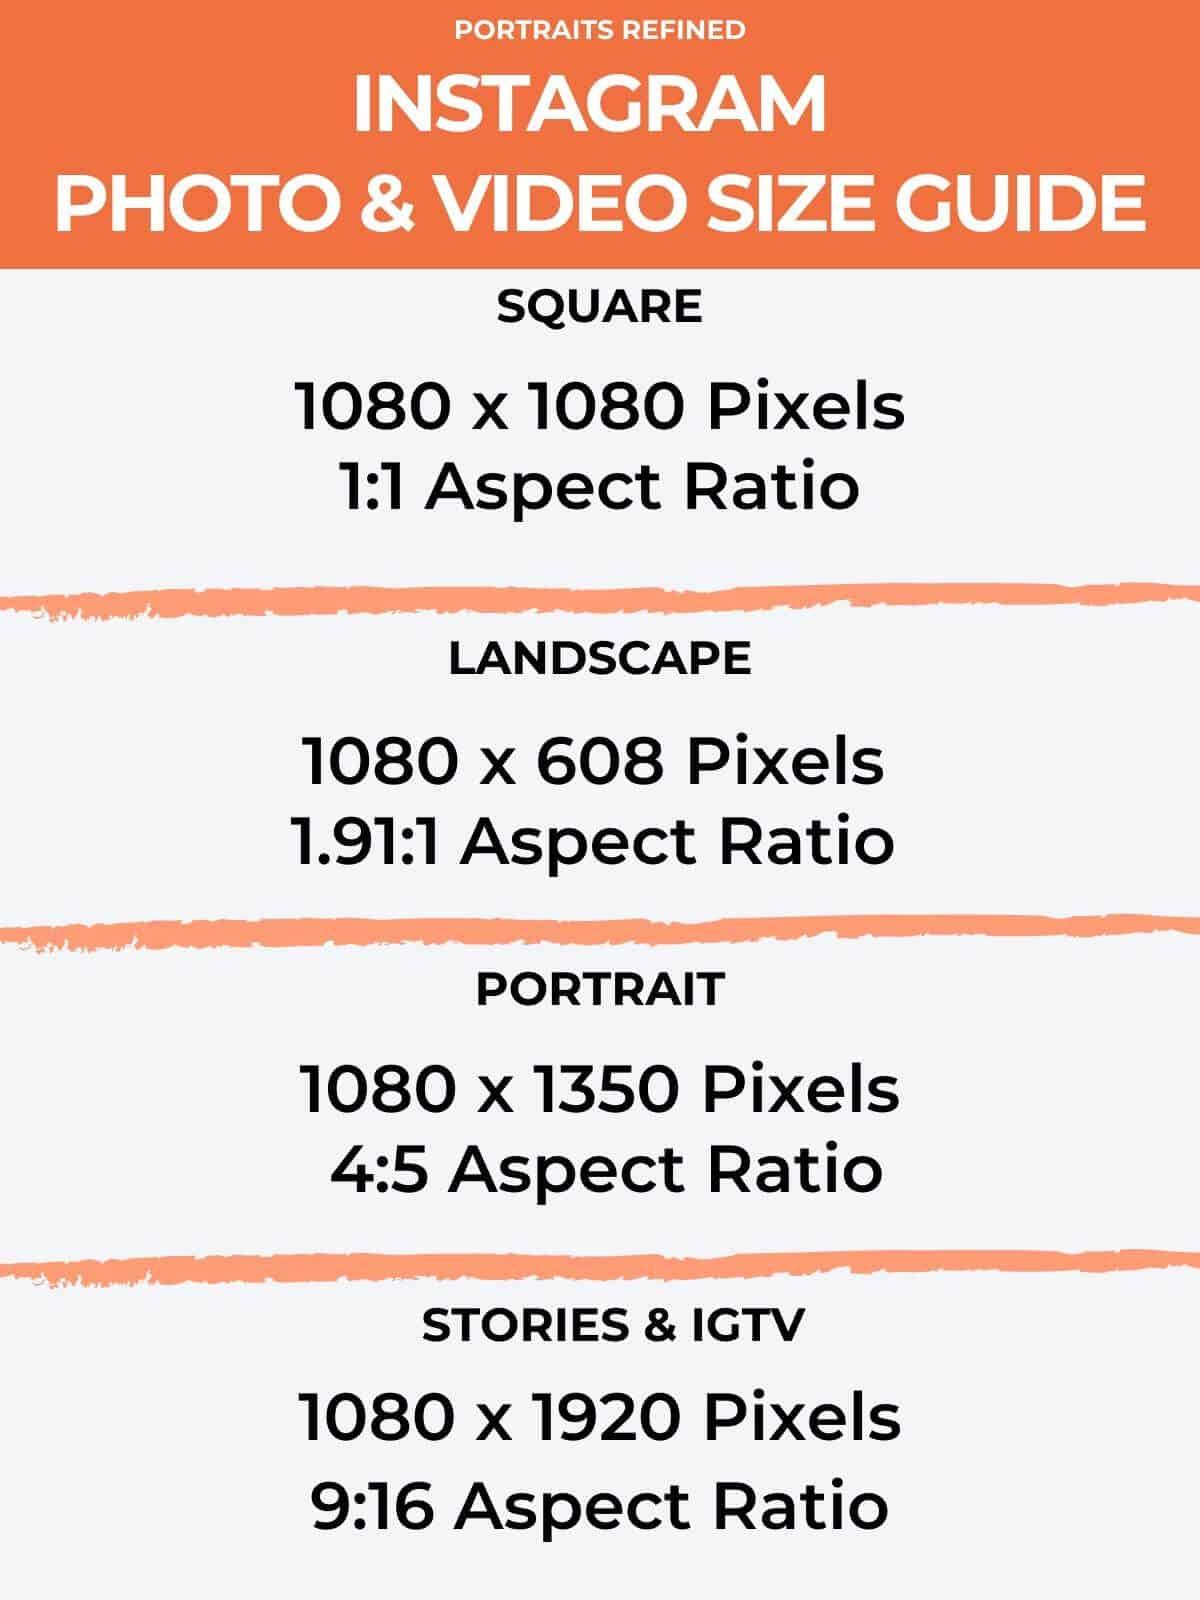 Instagram photo size infographic.